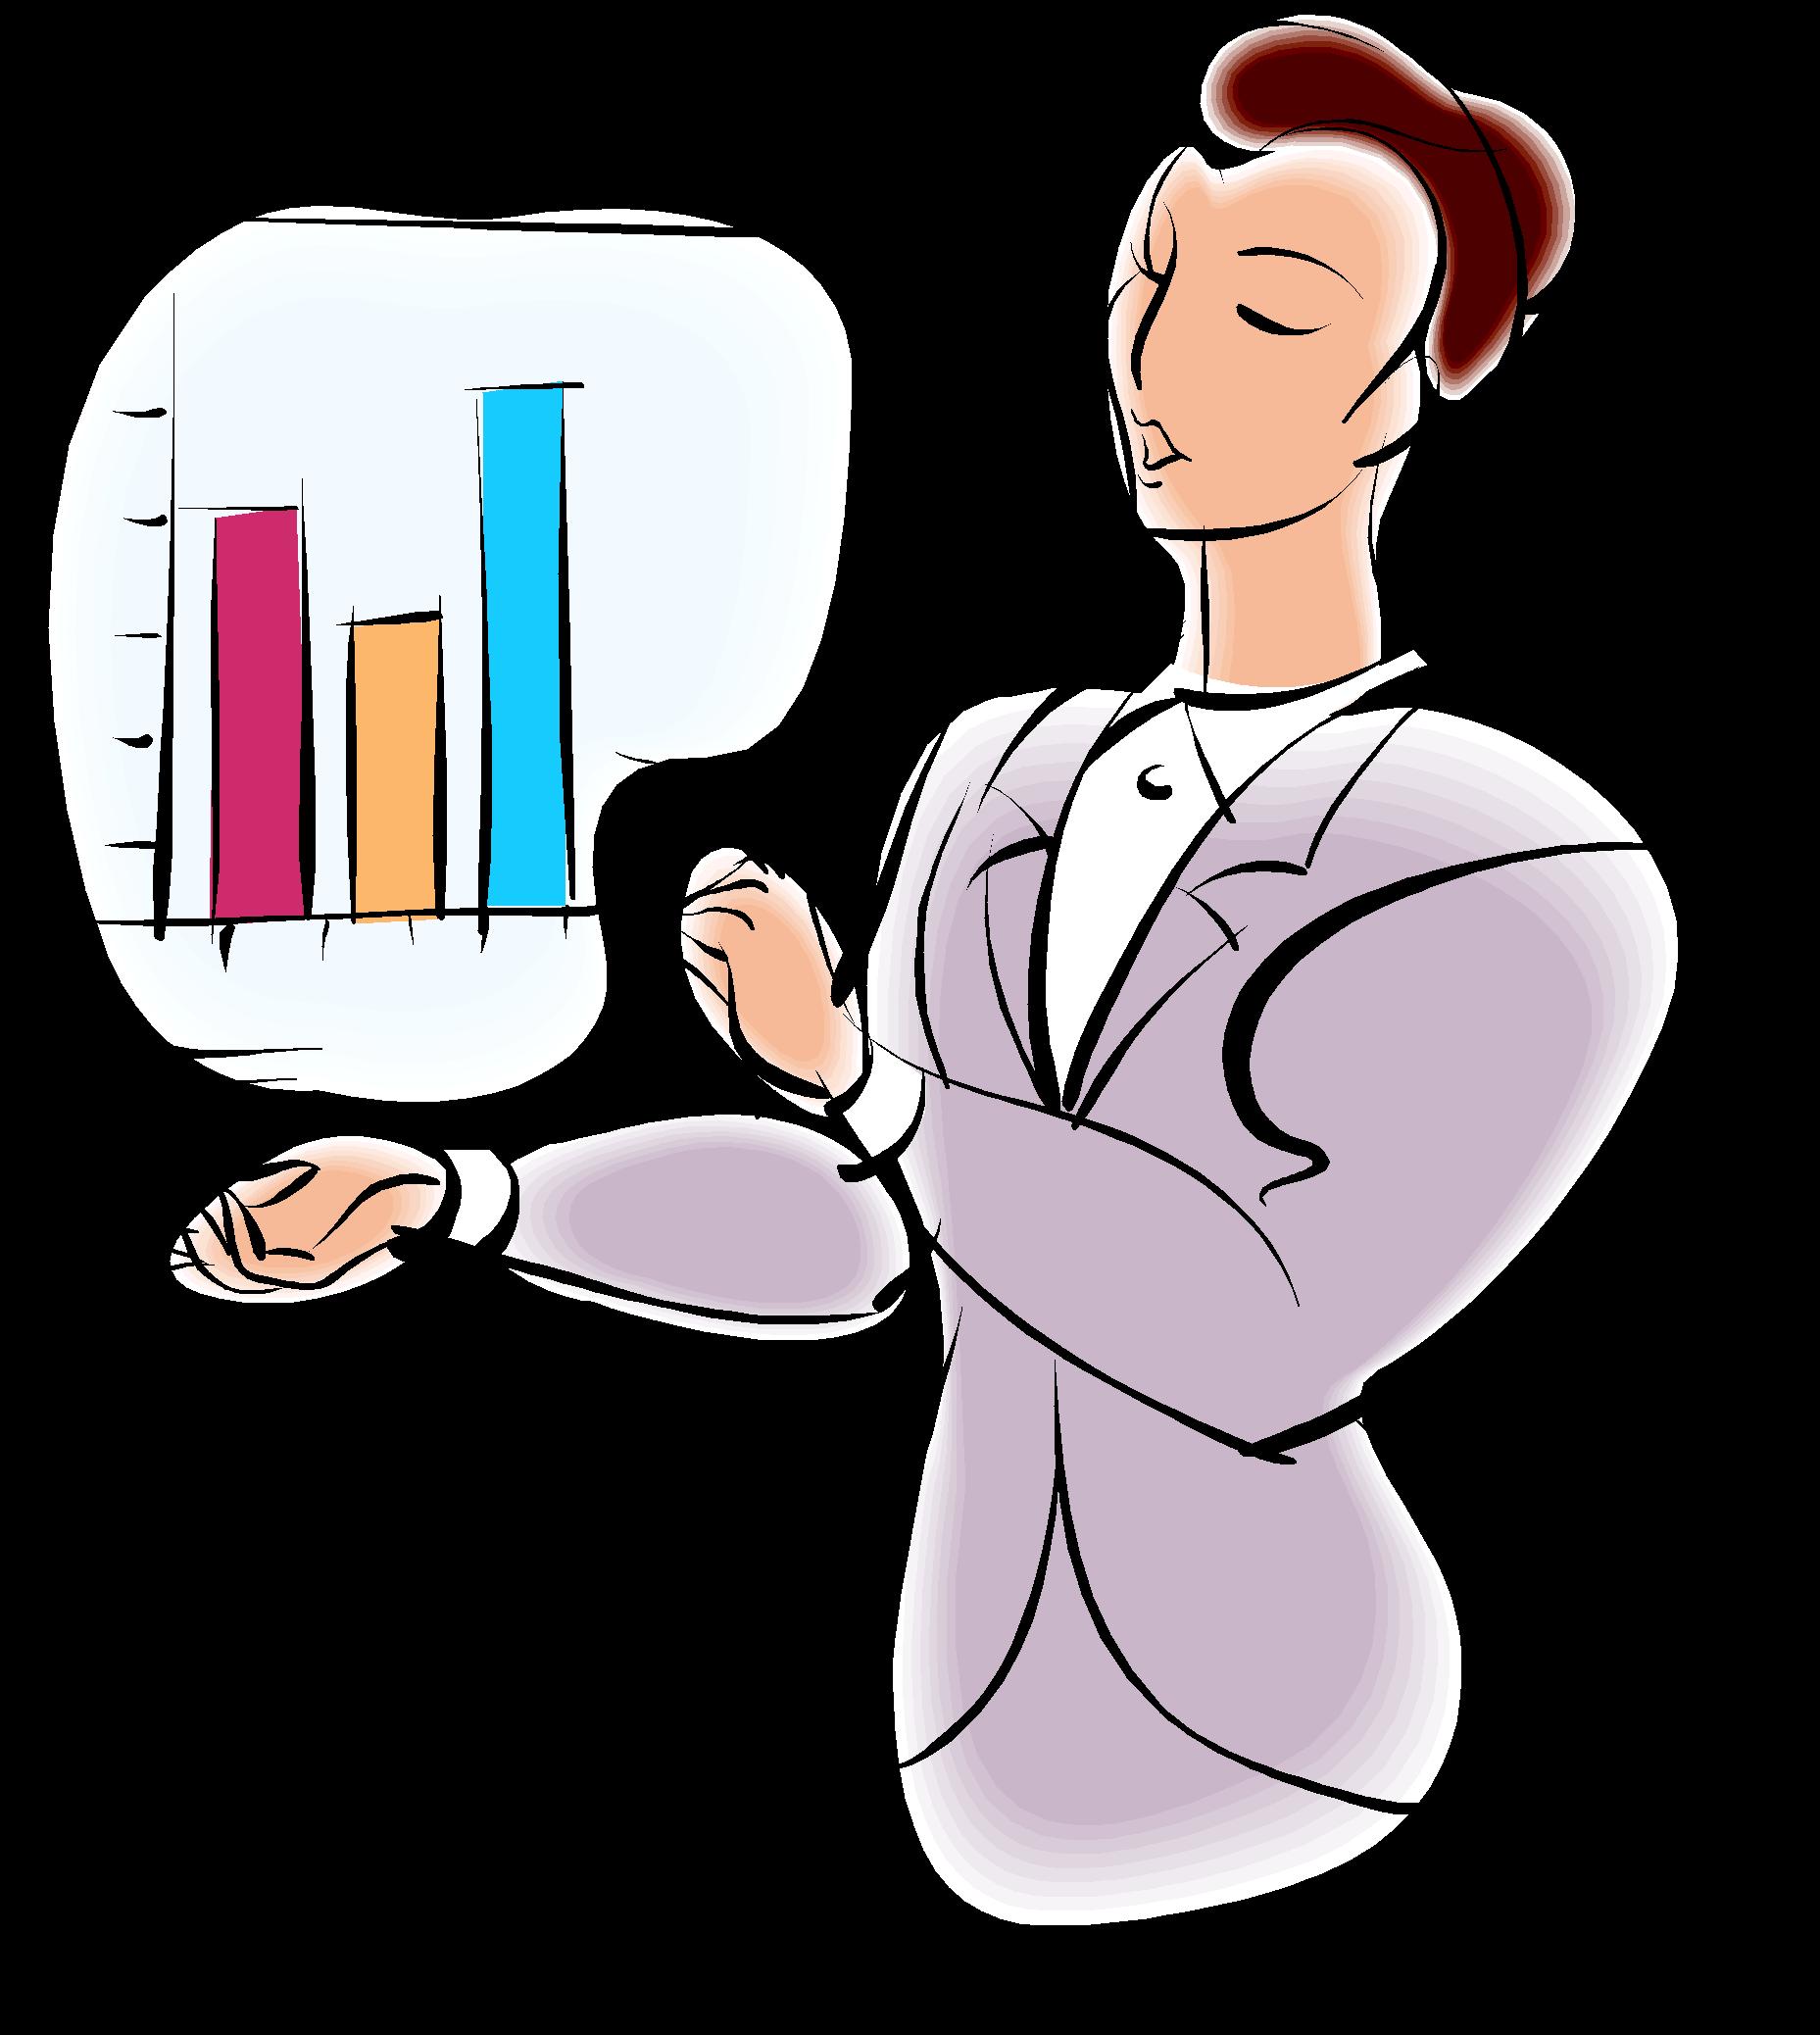 Goals clipart organization. Principles of management pom